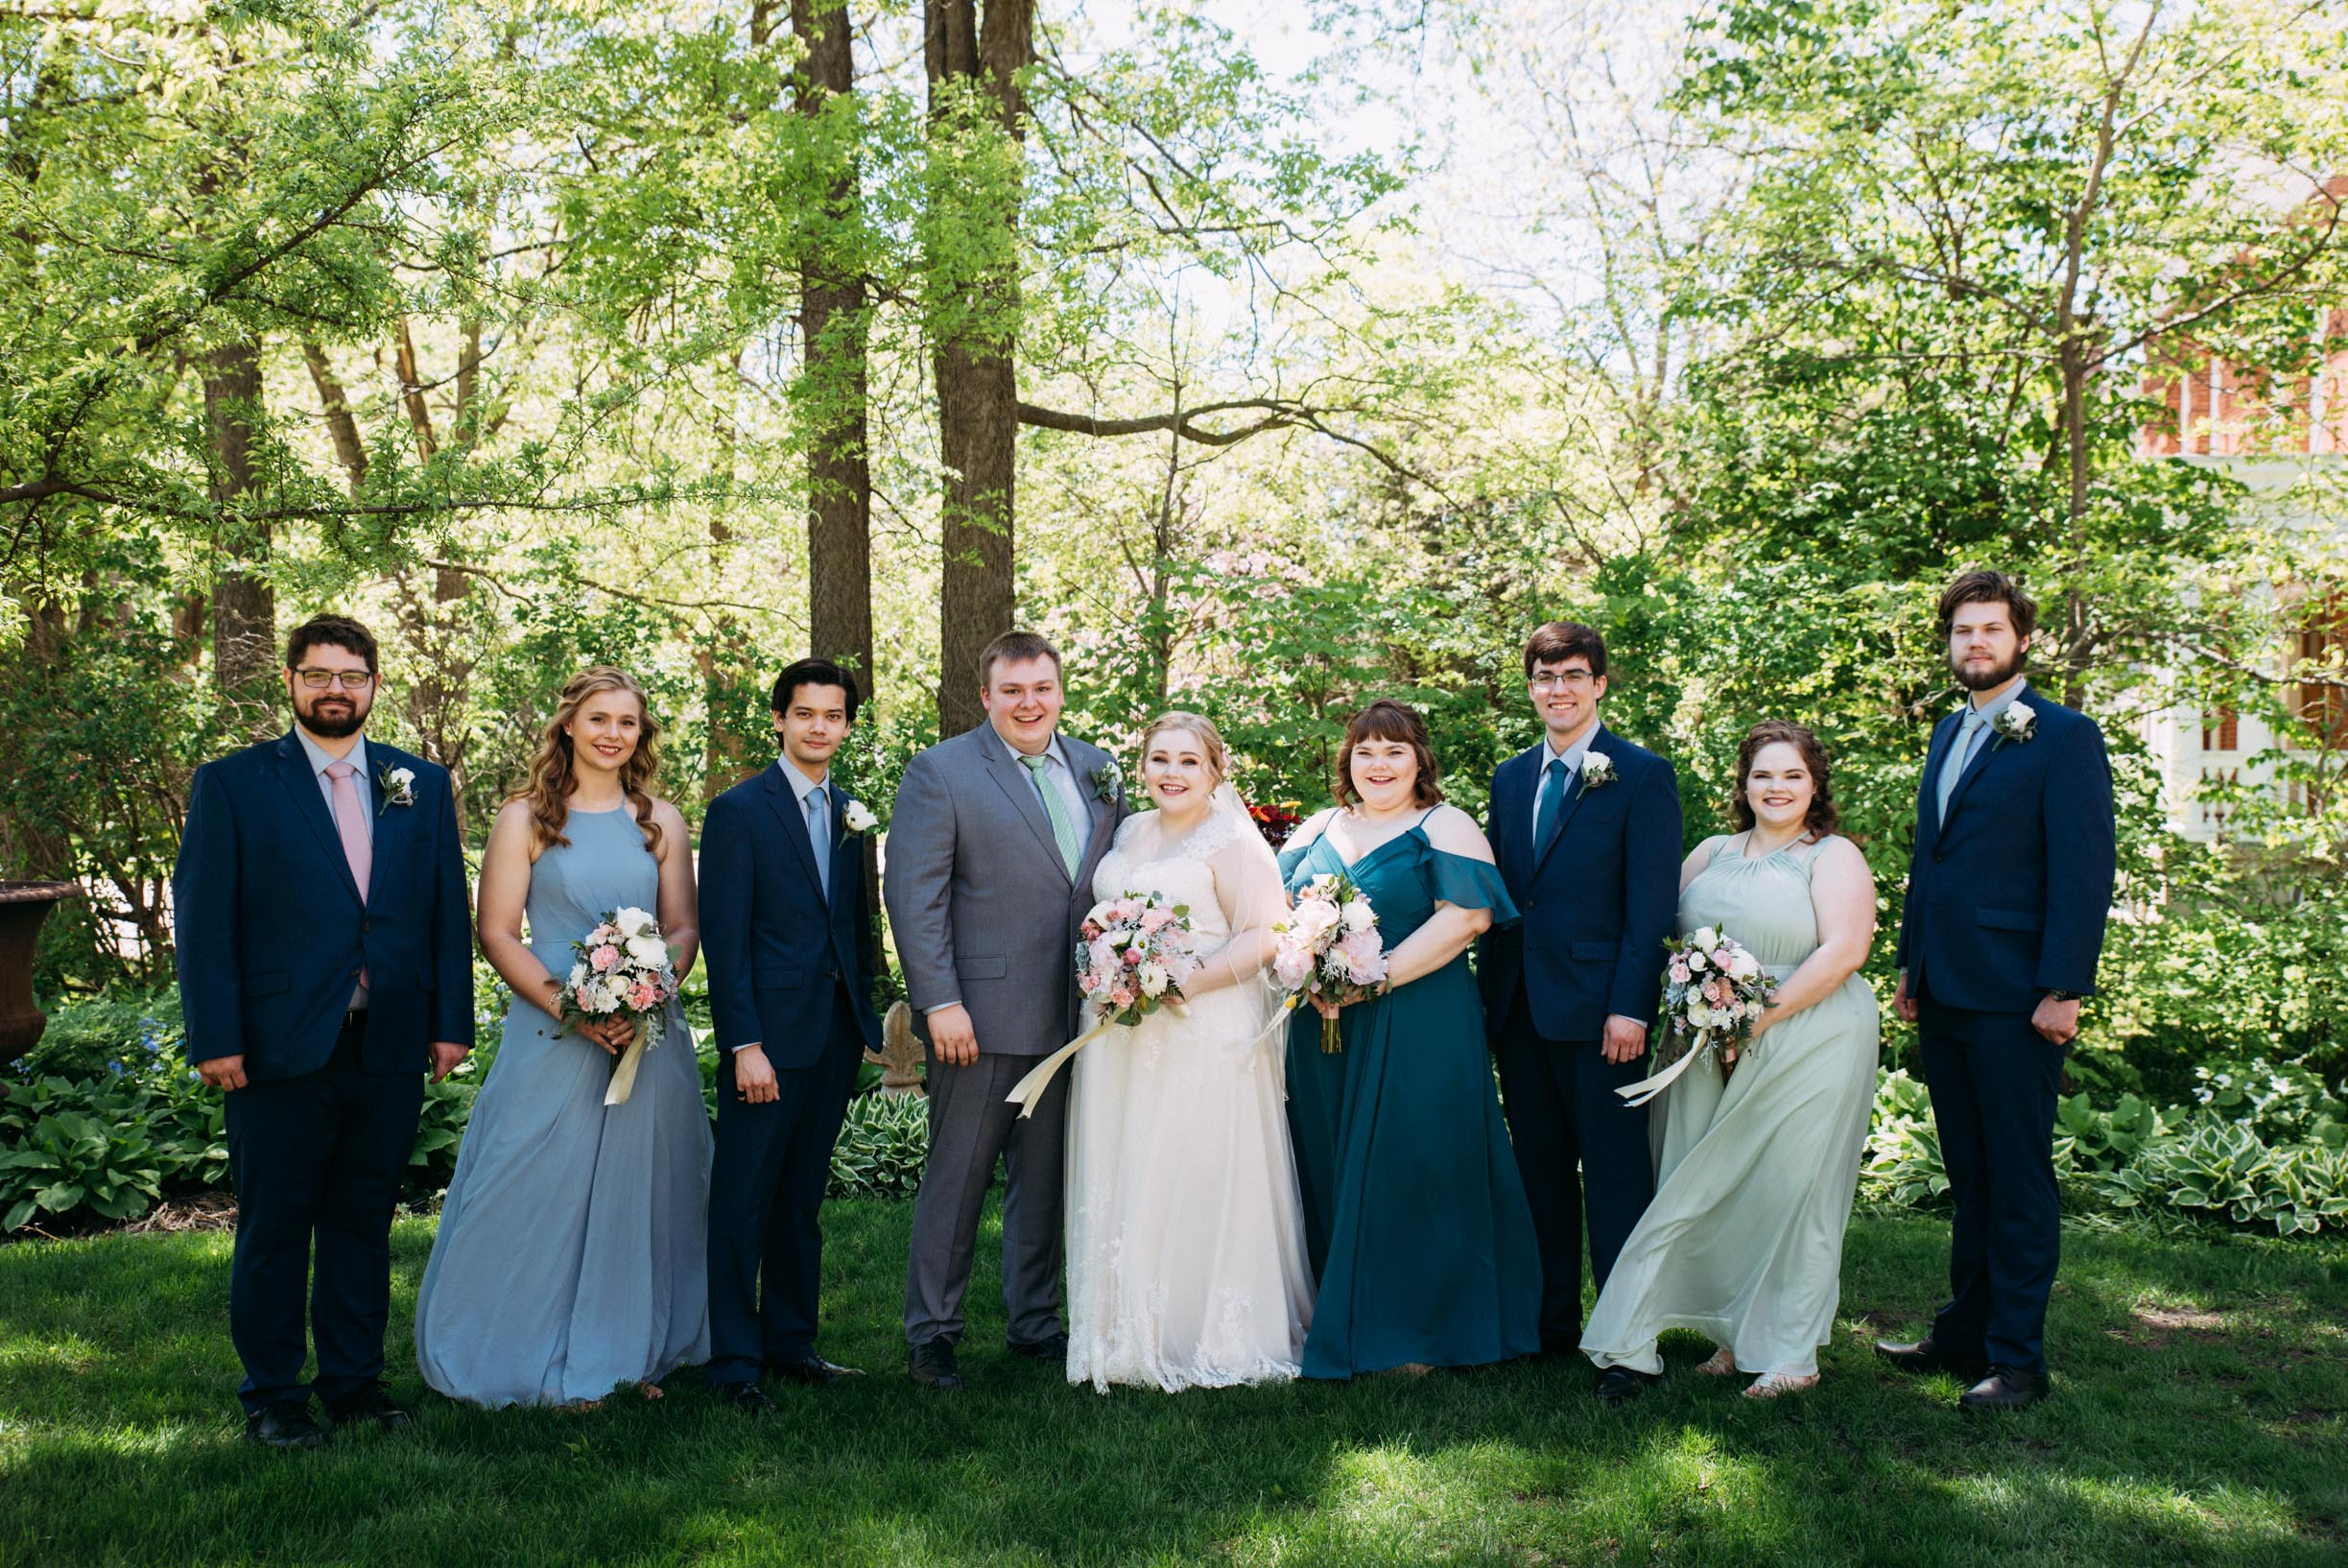 Hannah_Brandon_Wisconsin_Wedding_First_Look-14.jpg